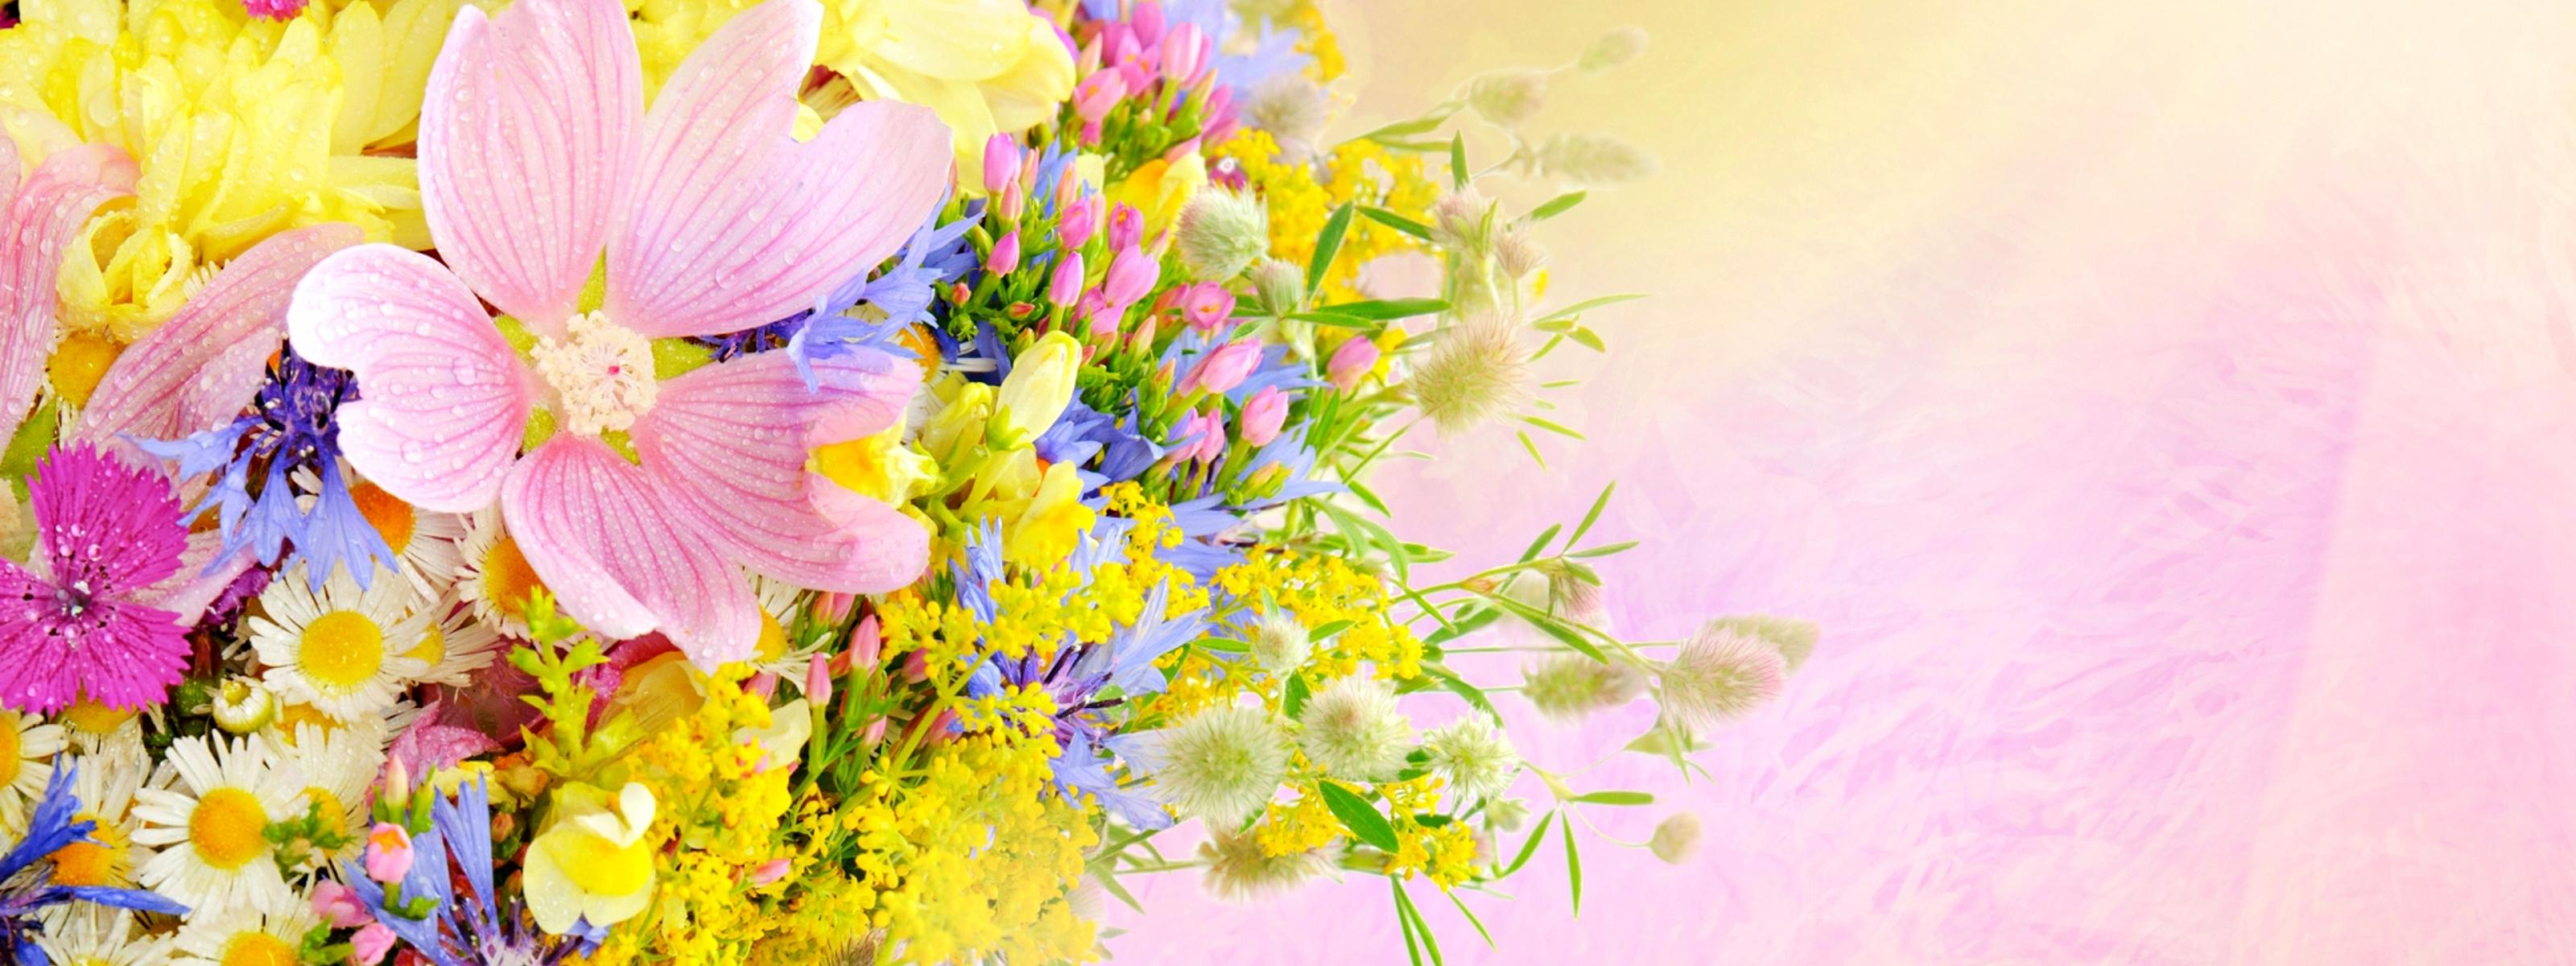 Spring flower perfume wonderful bouquet wallpaper download 3200x1200 download wallpaper 3200x1200 spring flower perfume wonderful bouquet mightylinksfo